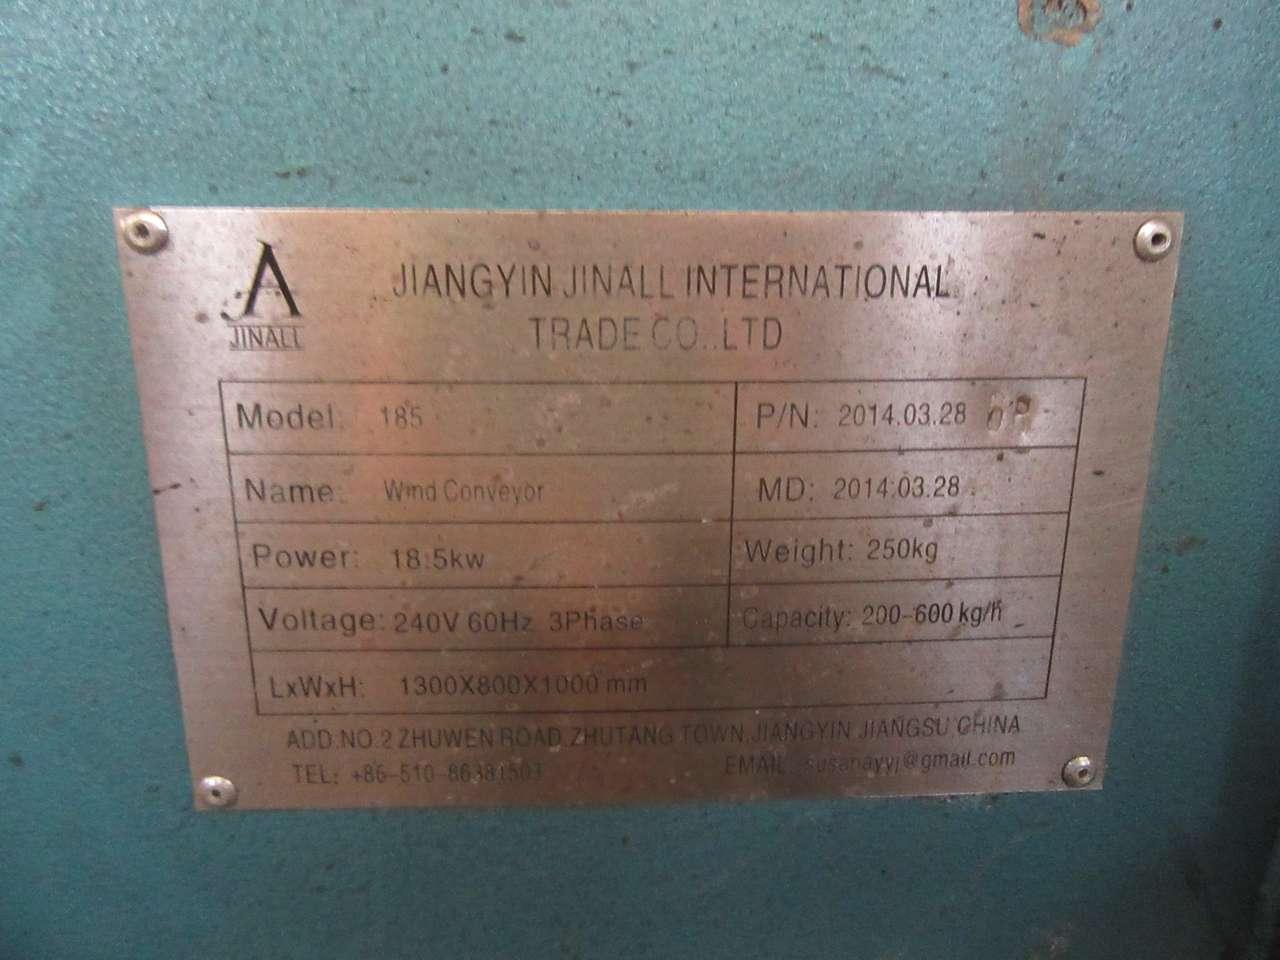 Lot 21 - 2014 Jiangyin Jinall International Trade Co. 185 Wind Conveyor